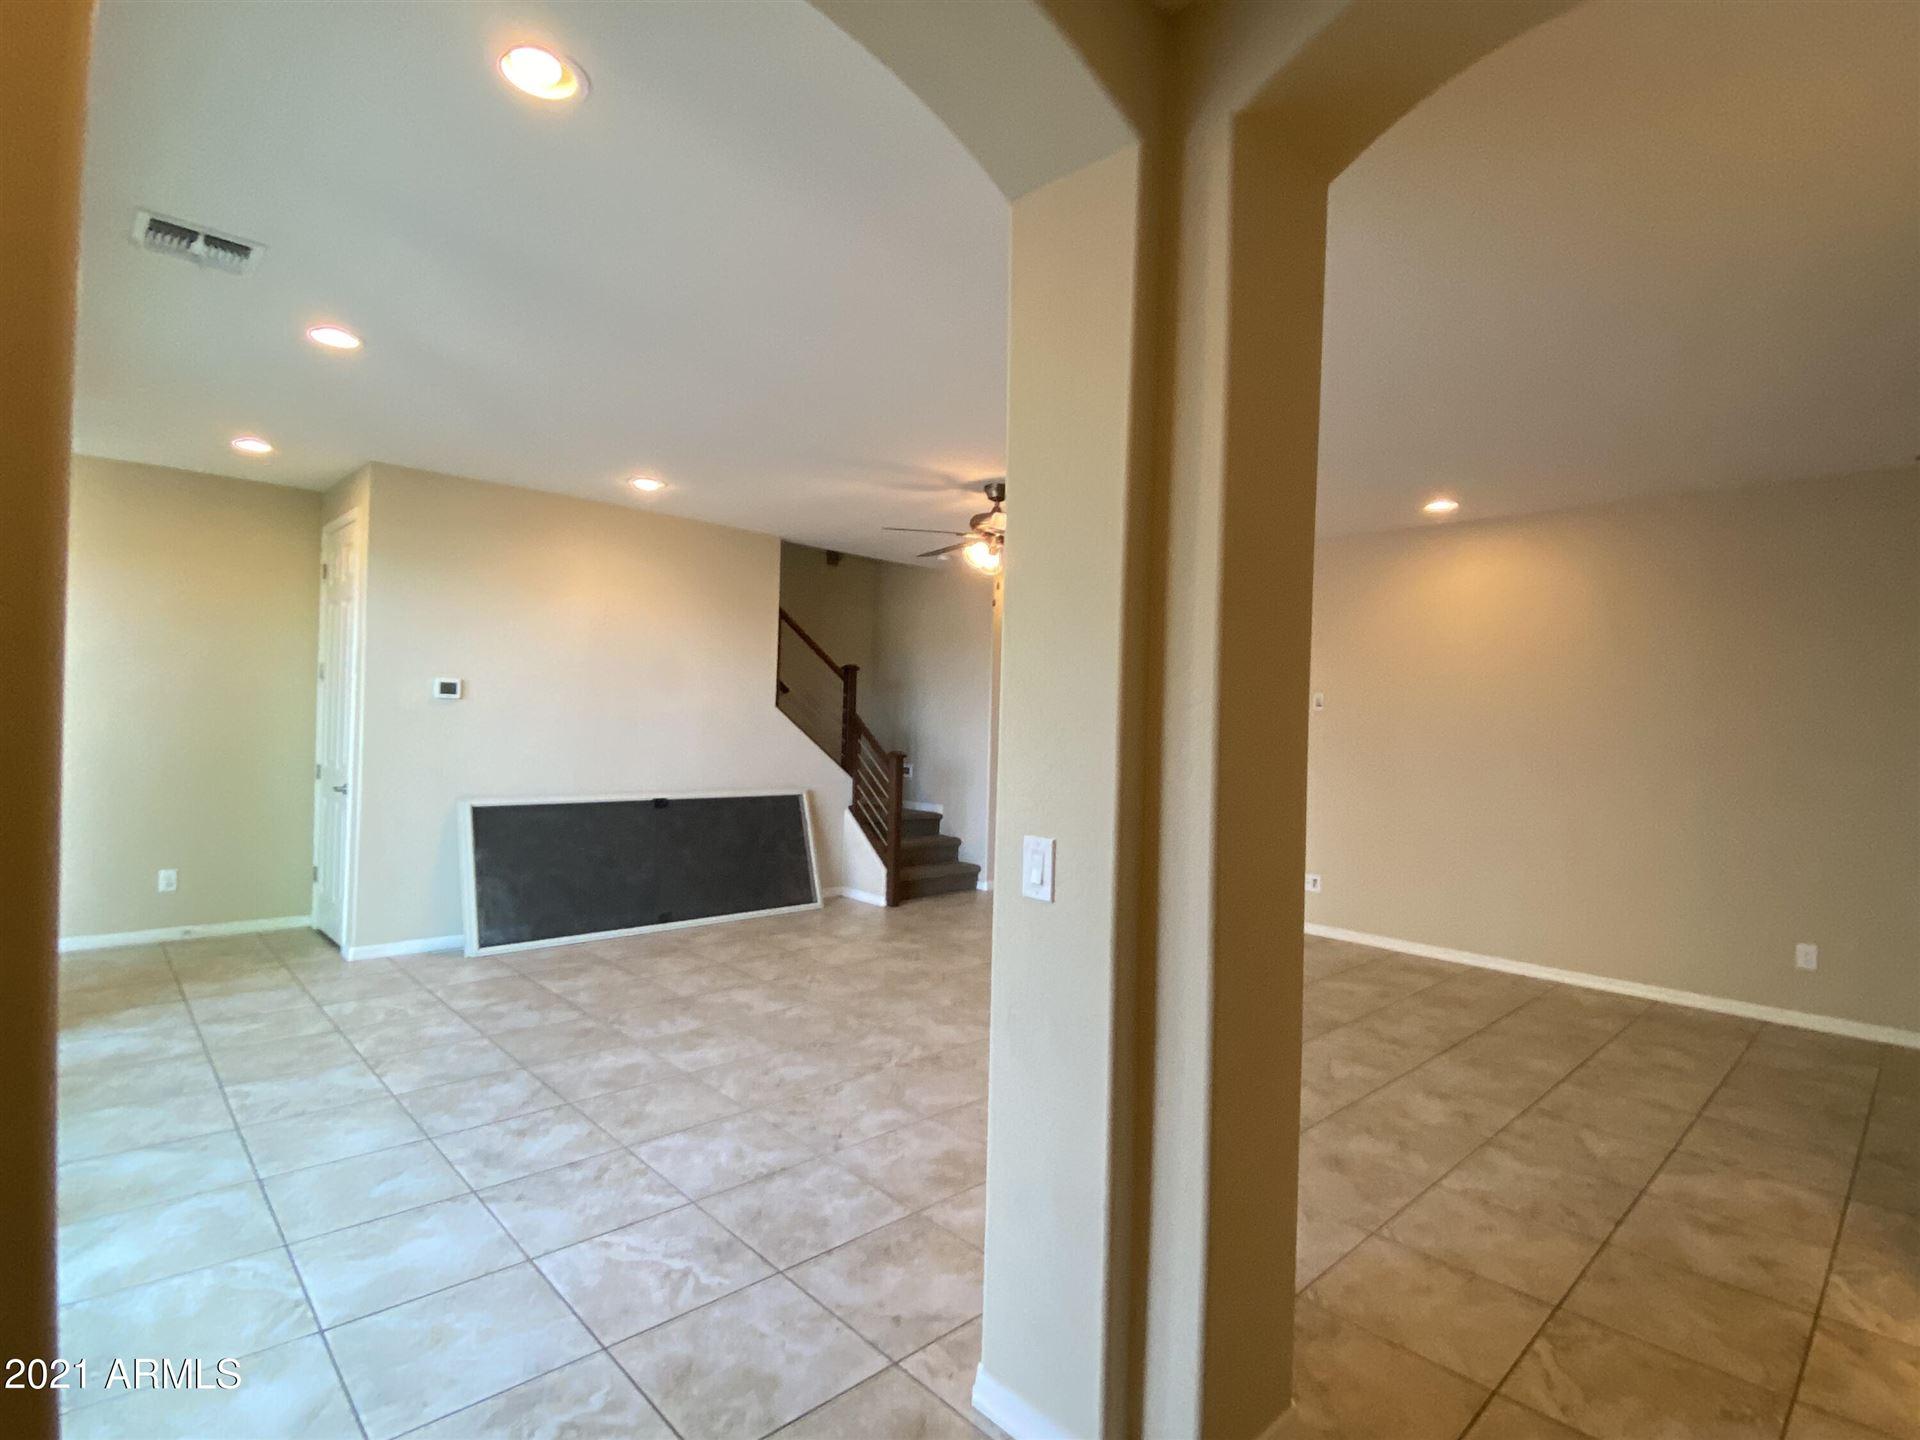 Photo of 3726 E ANGSTED Drive, Gilbert, AZ 85296 (MLS # 6296553)